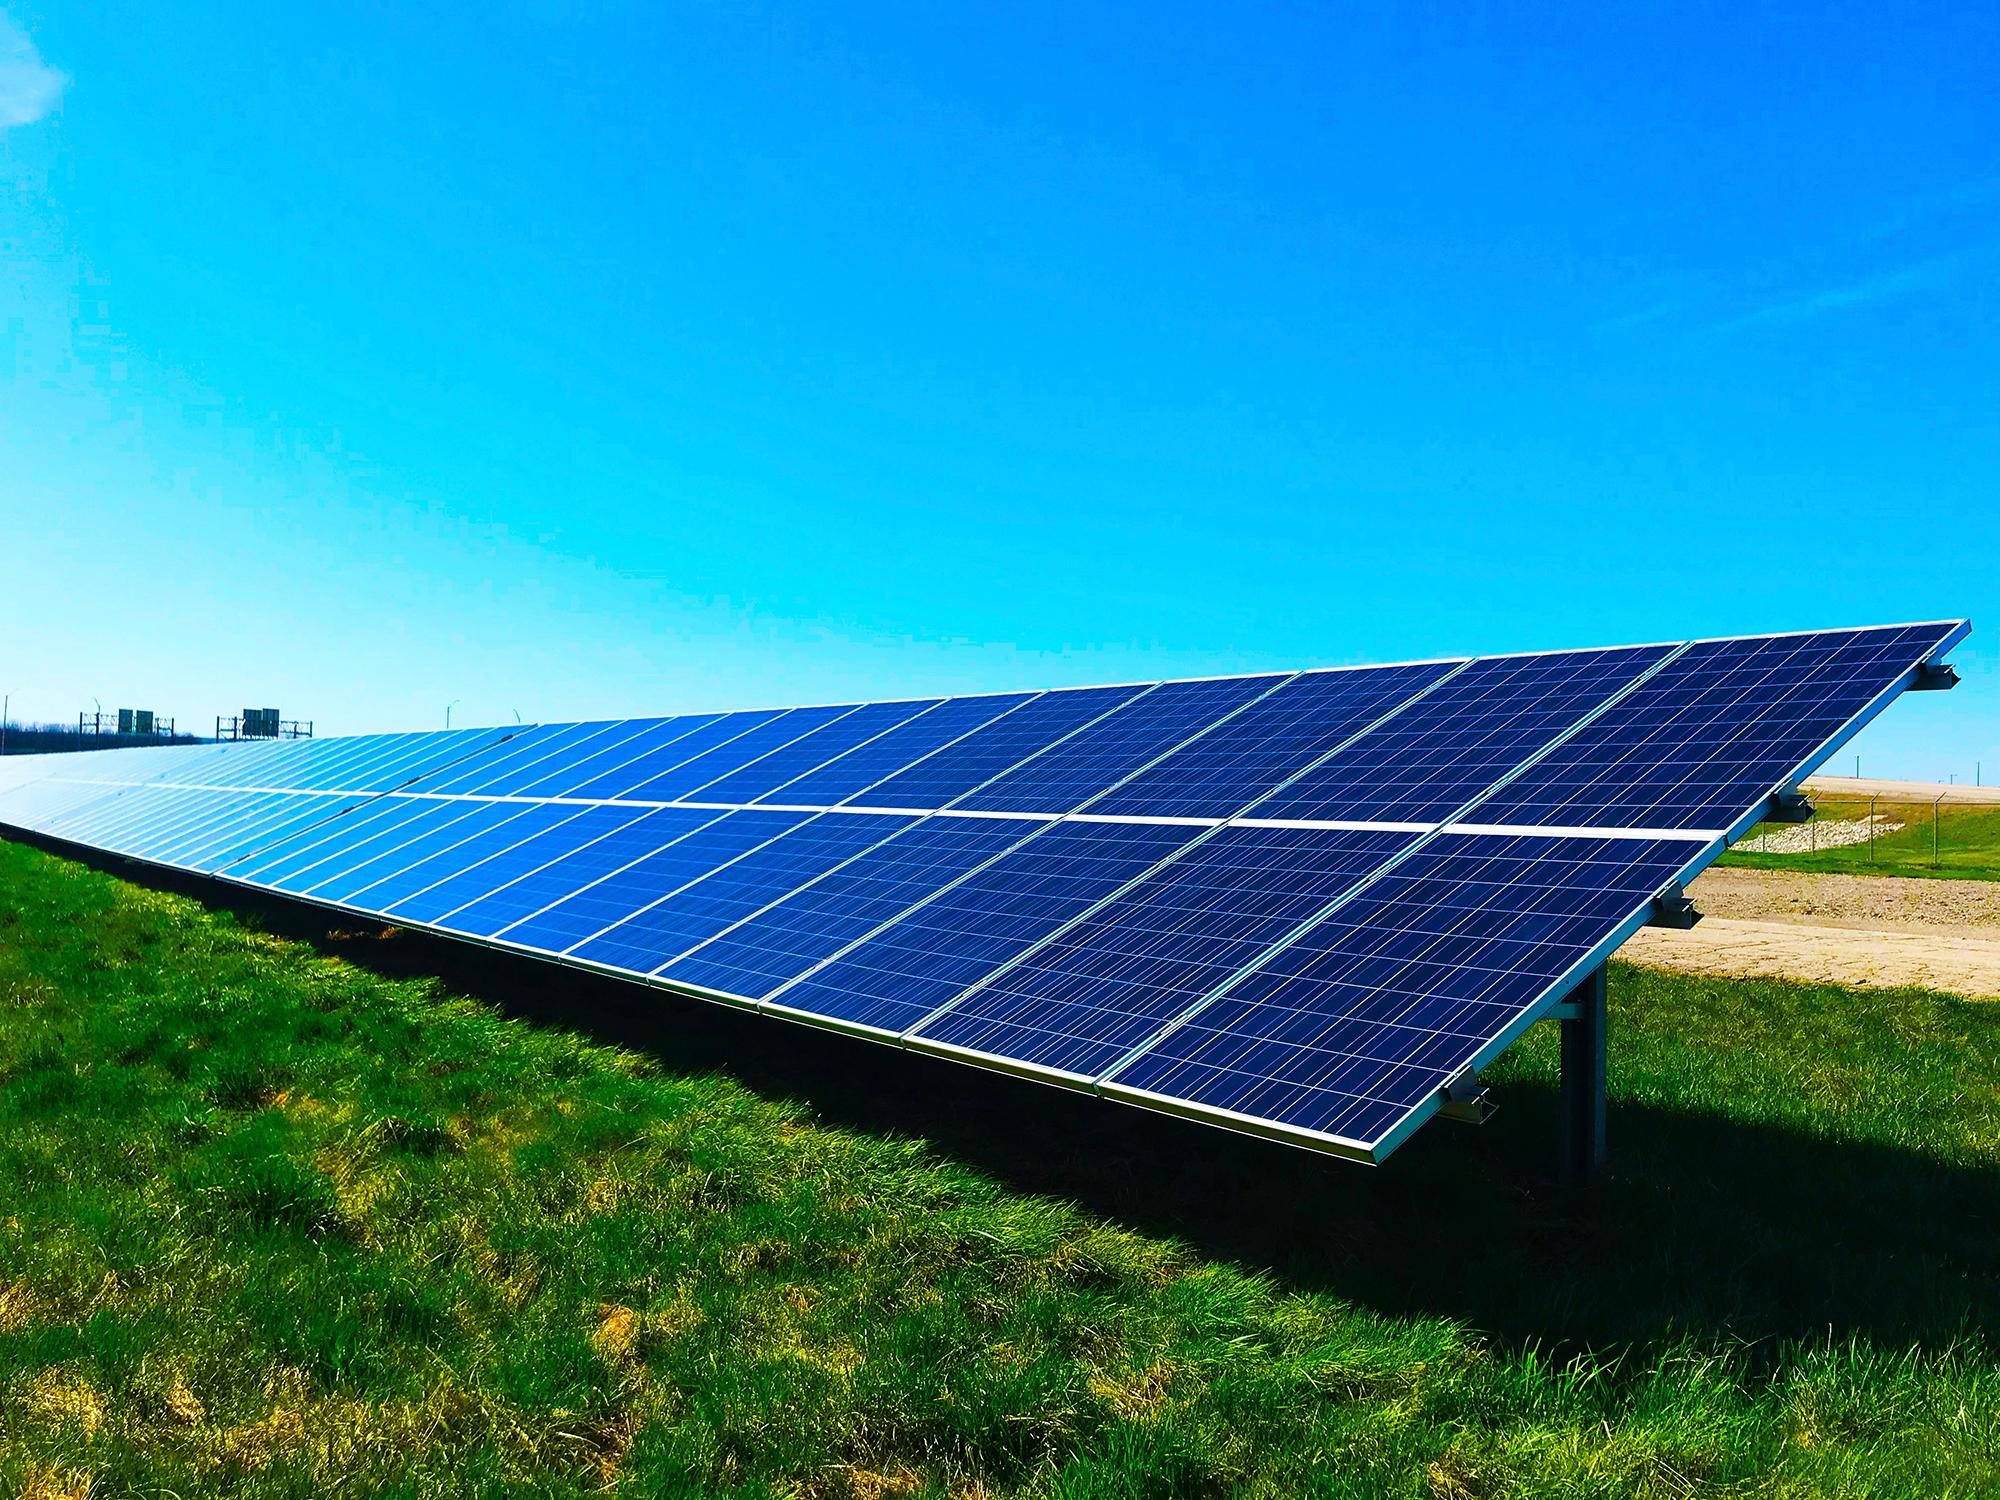 AleaSoft - Panel solar fotovoltaico